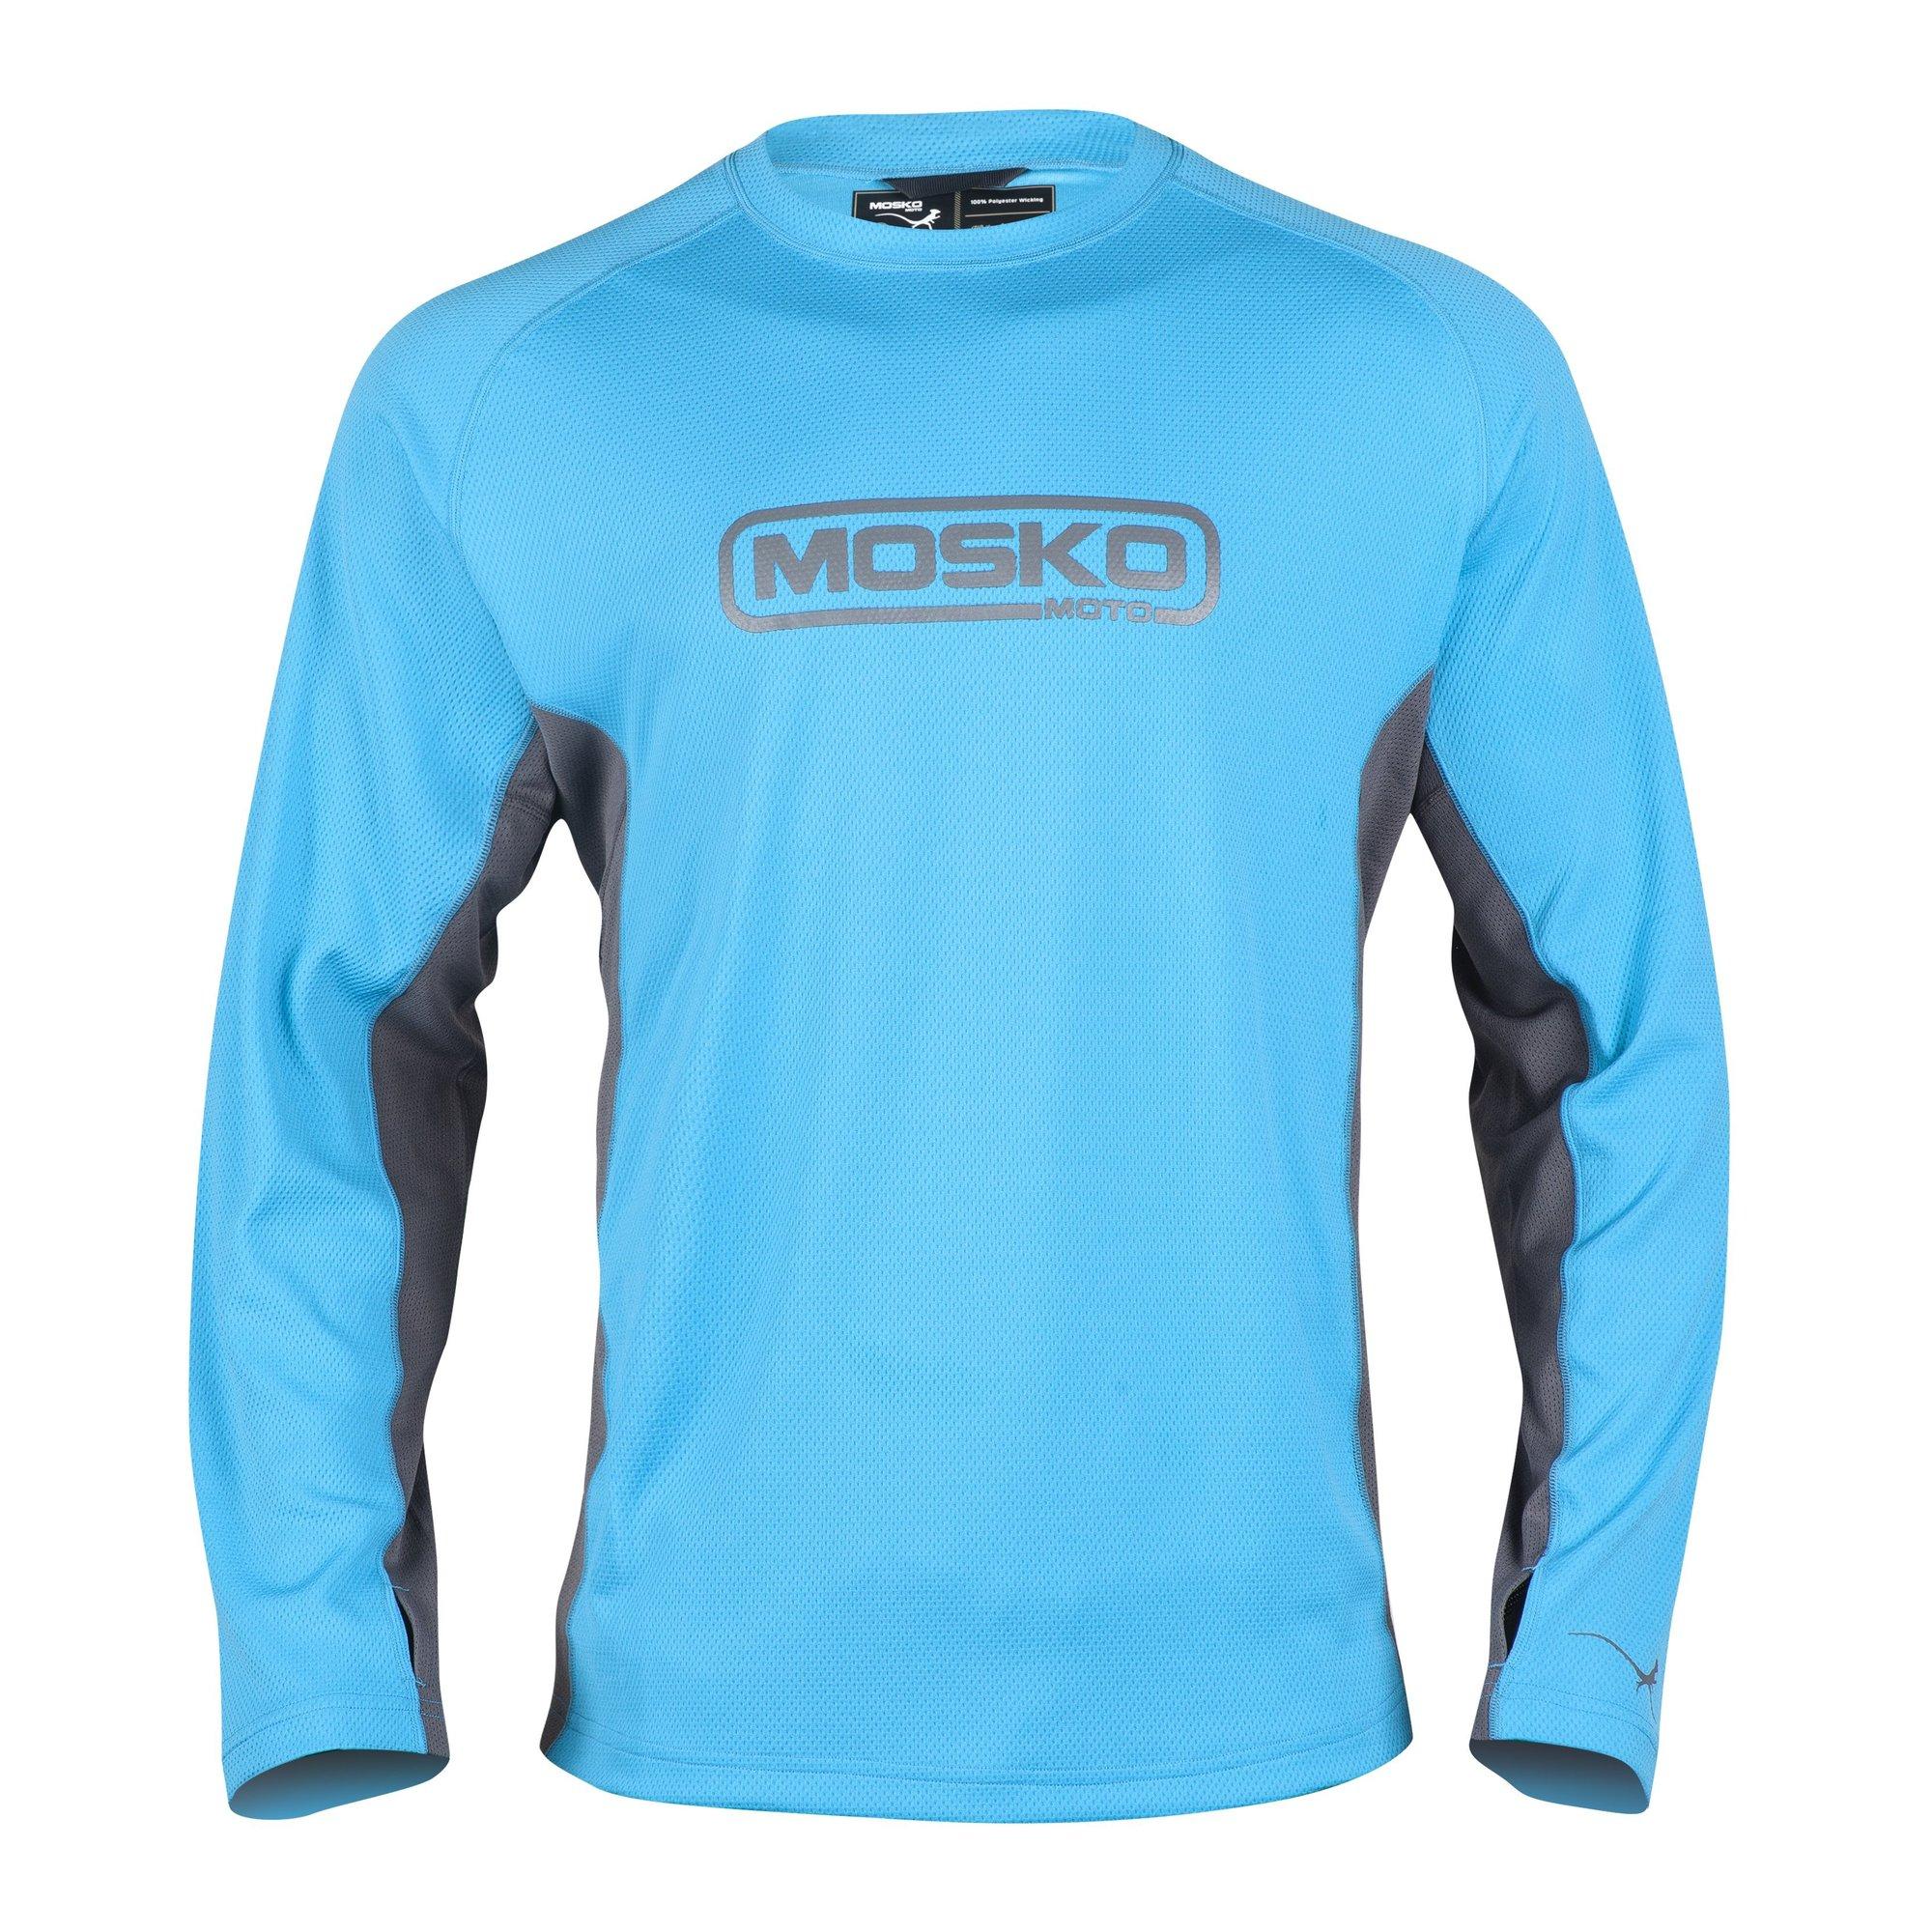 mosko-moto-apparel-signal-jersey-11333239013437_2000x.jpg